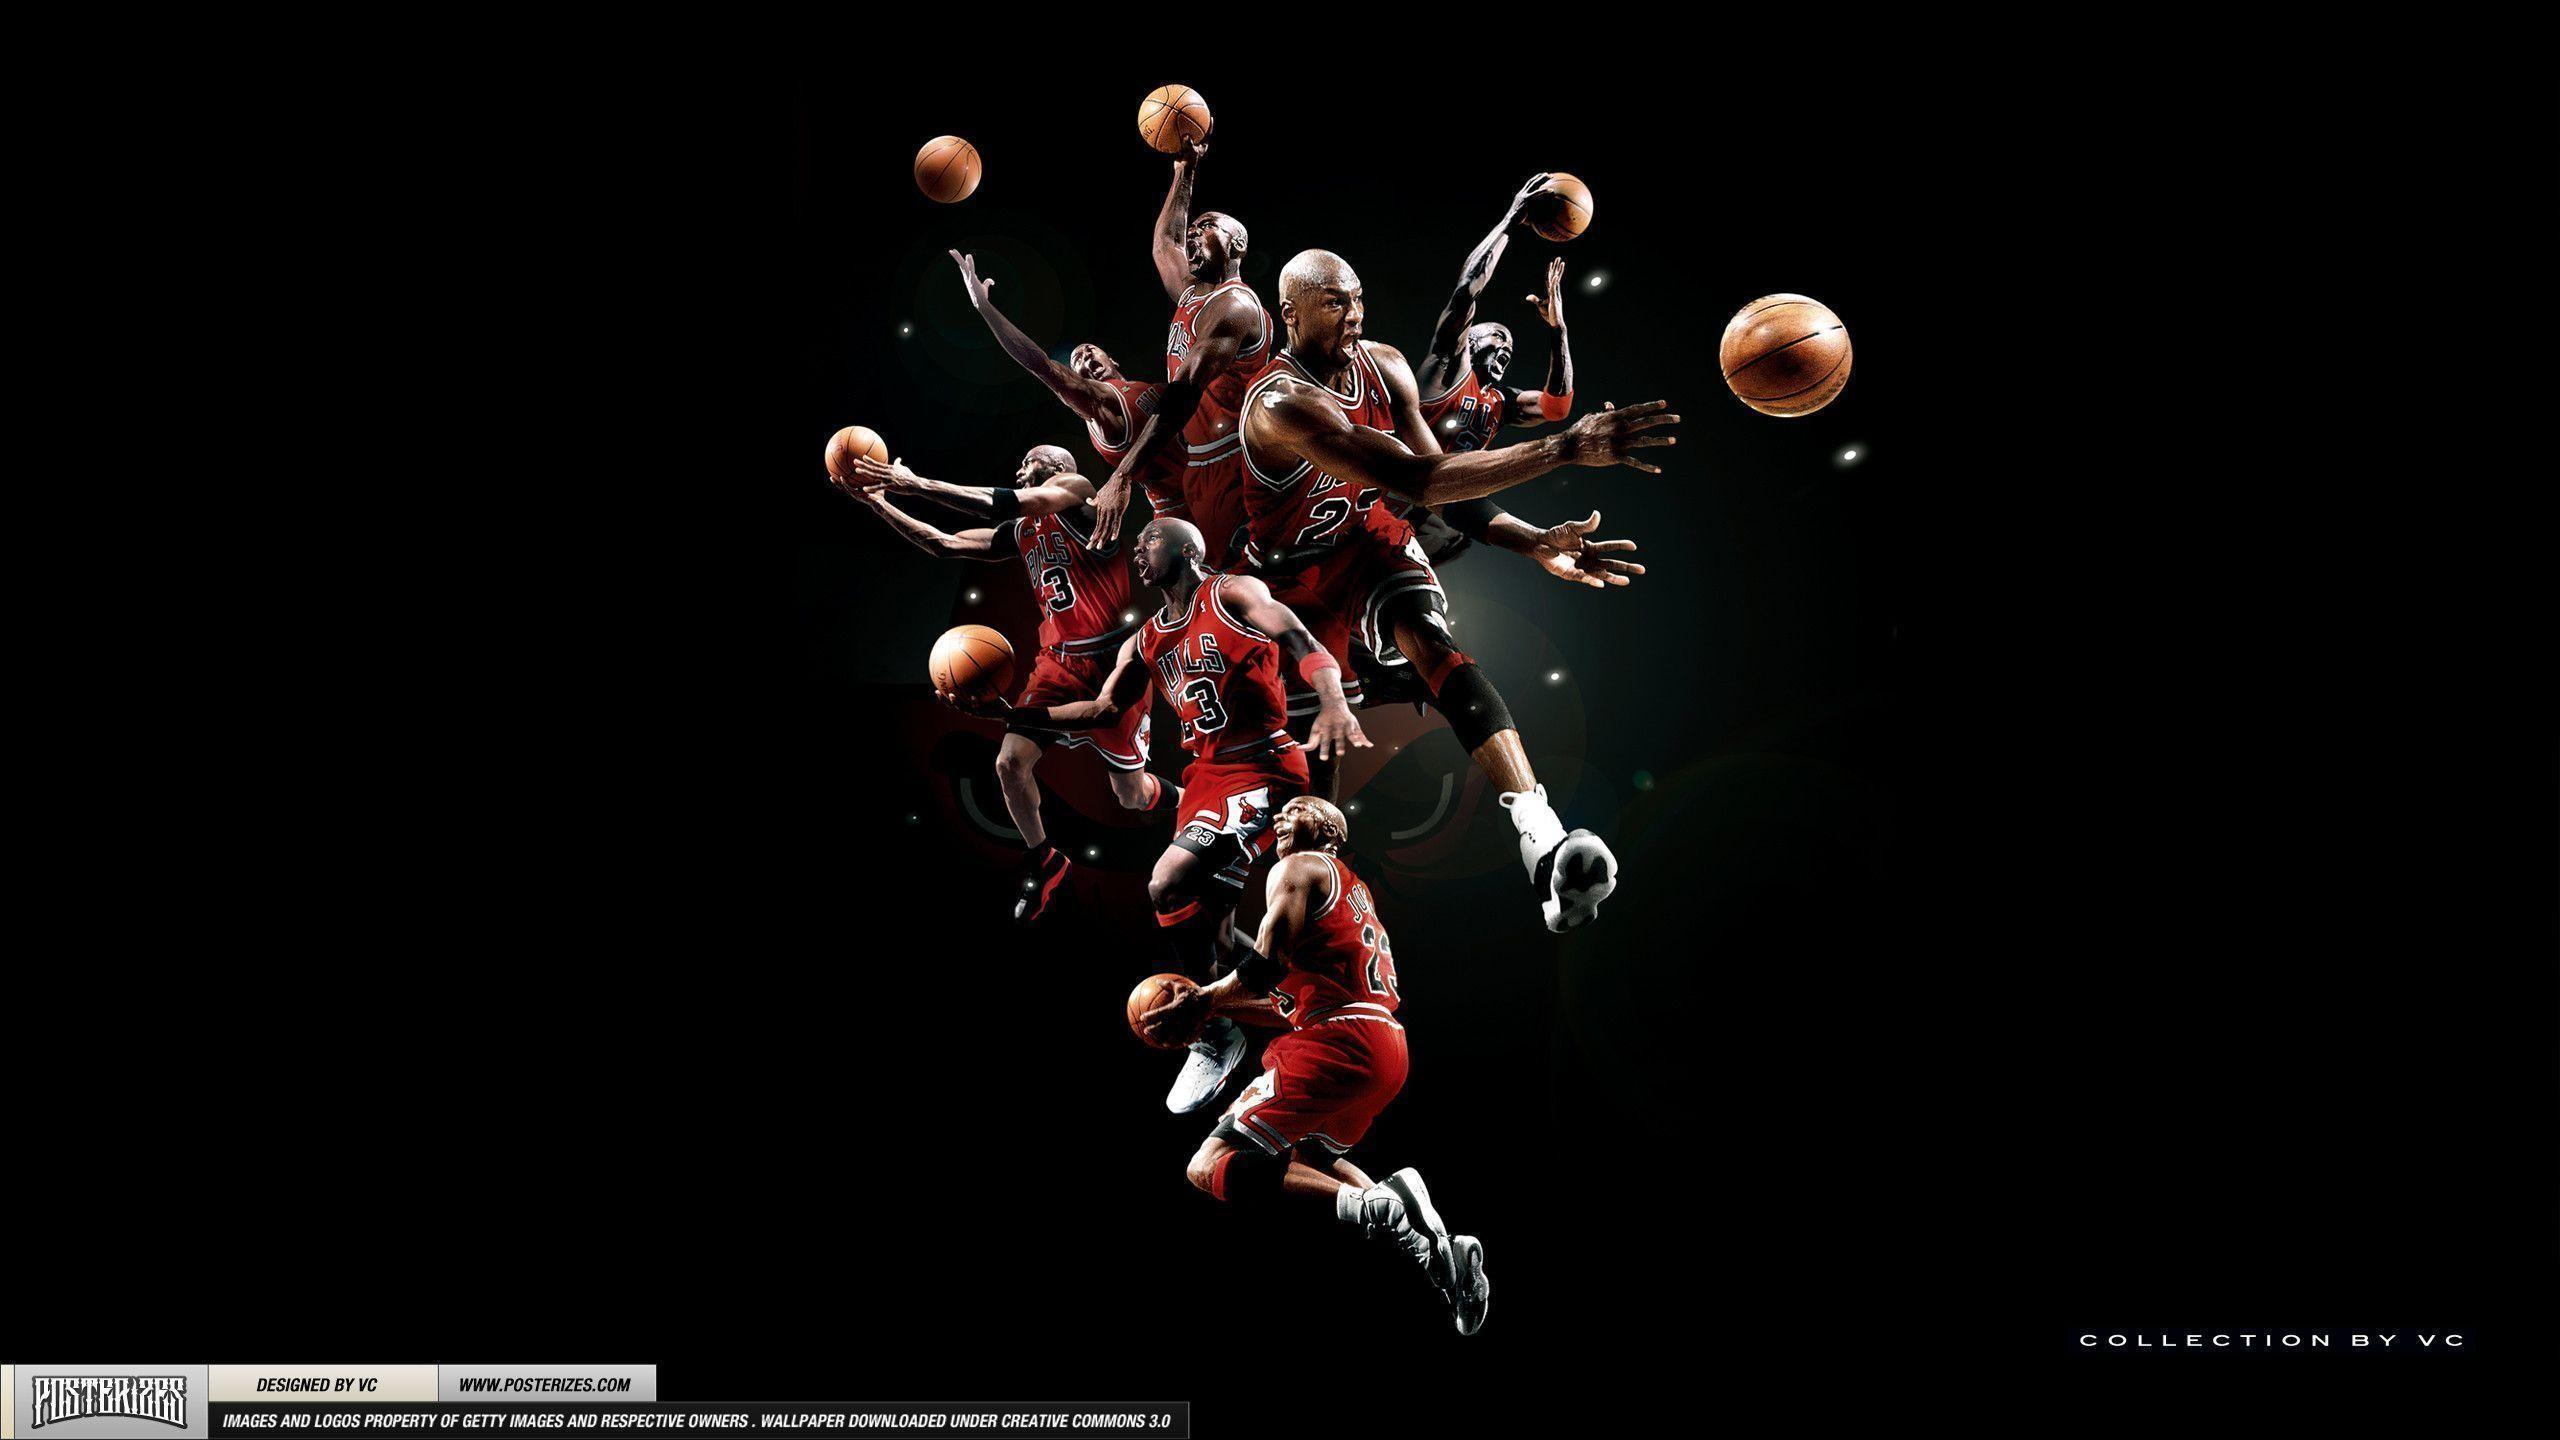 Best Jordan Wallpapers 71 images 2560x1440